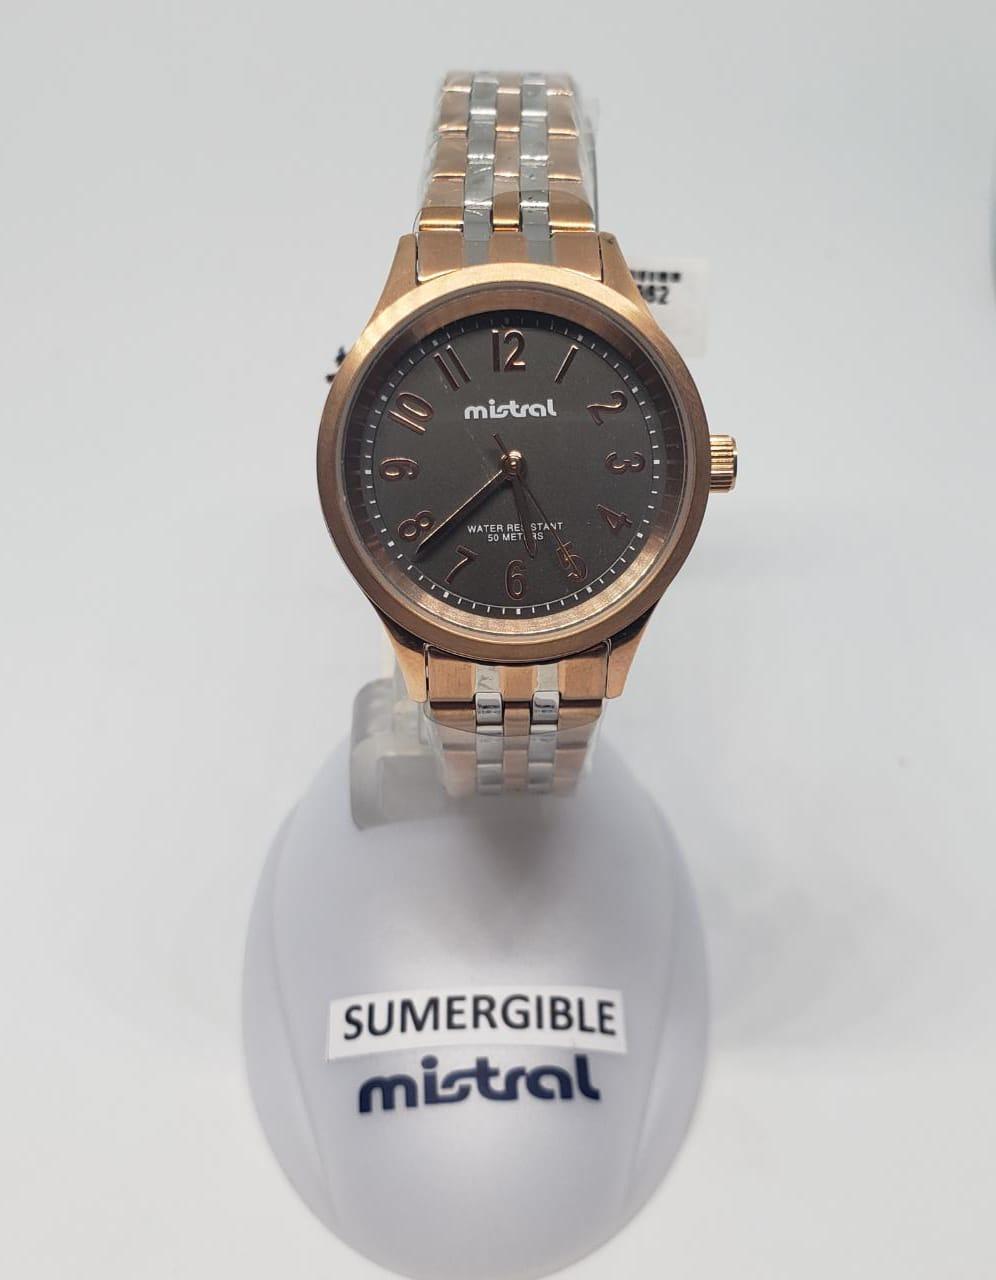 b8ee44cd3ebd Reloj Mistral de dama Analogo – Joyas Lan